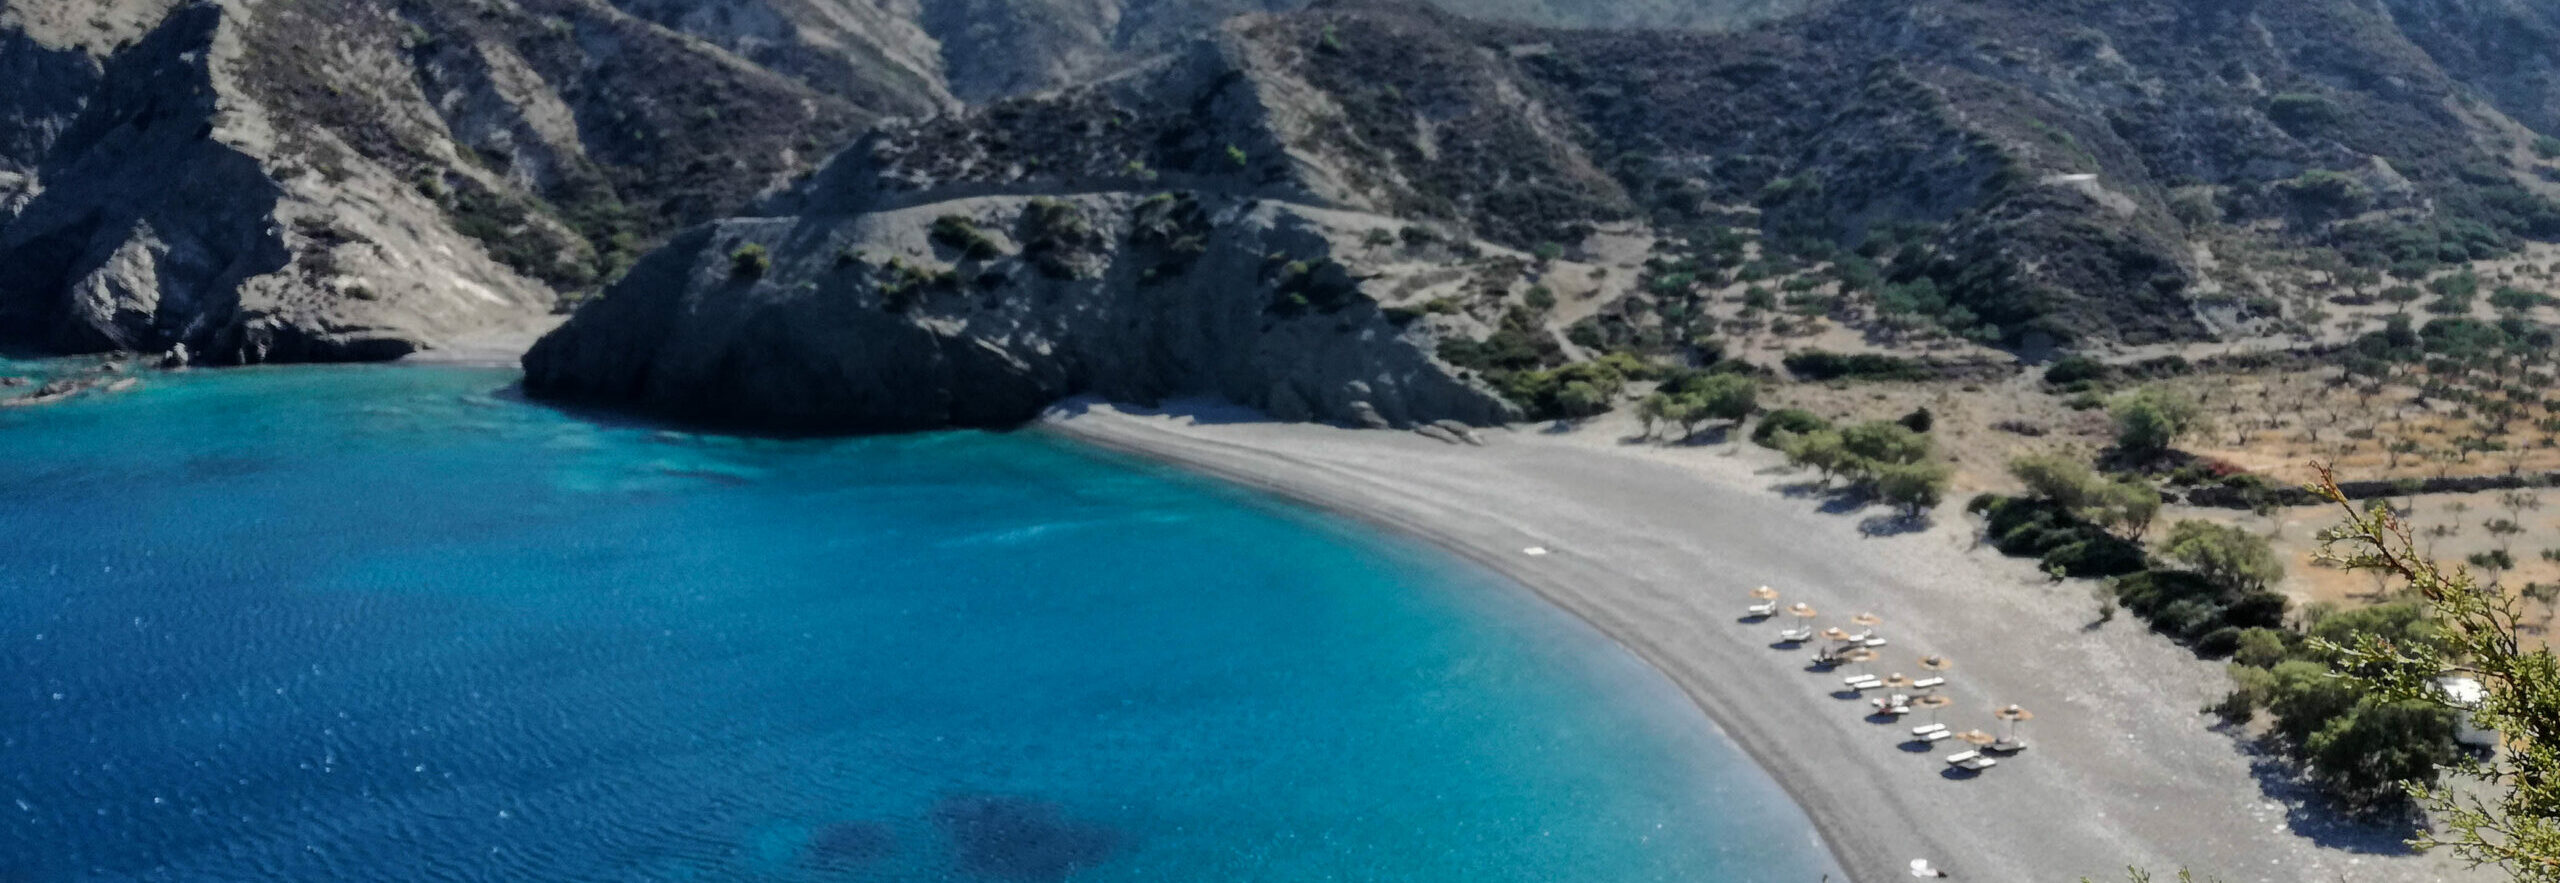 Karpathos: the island of 100 beaches